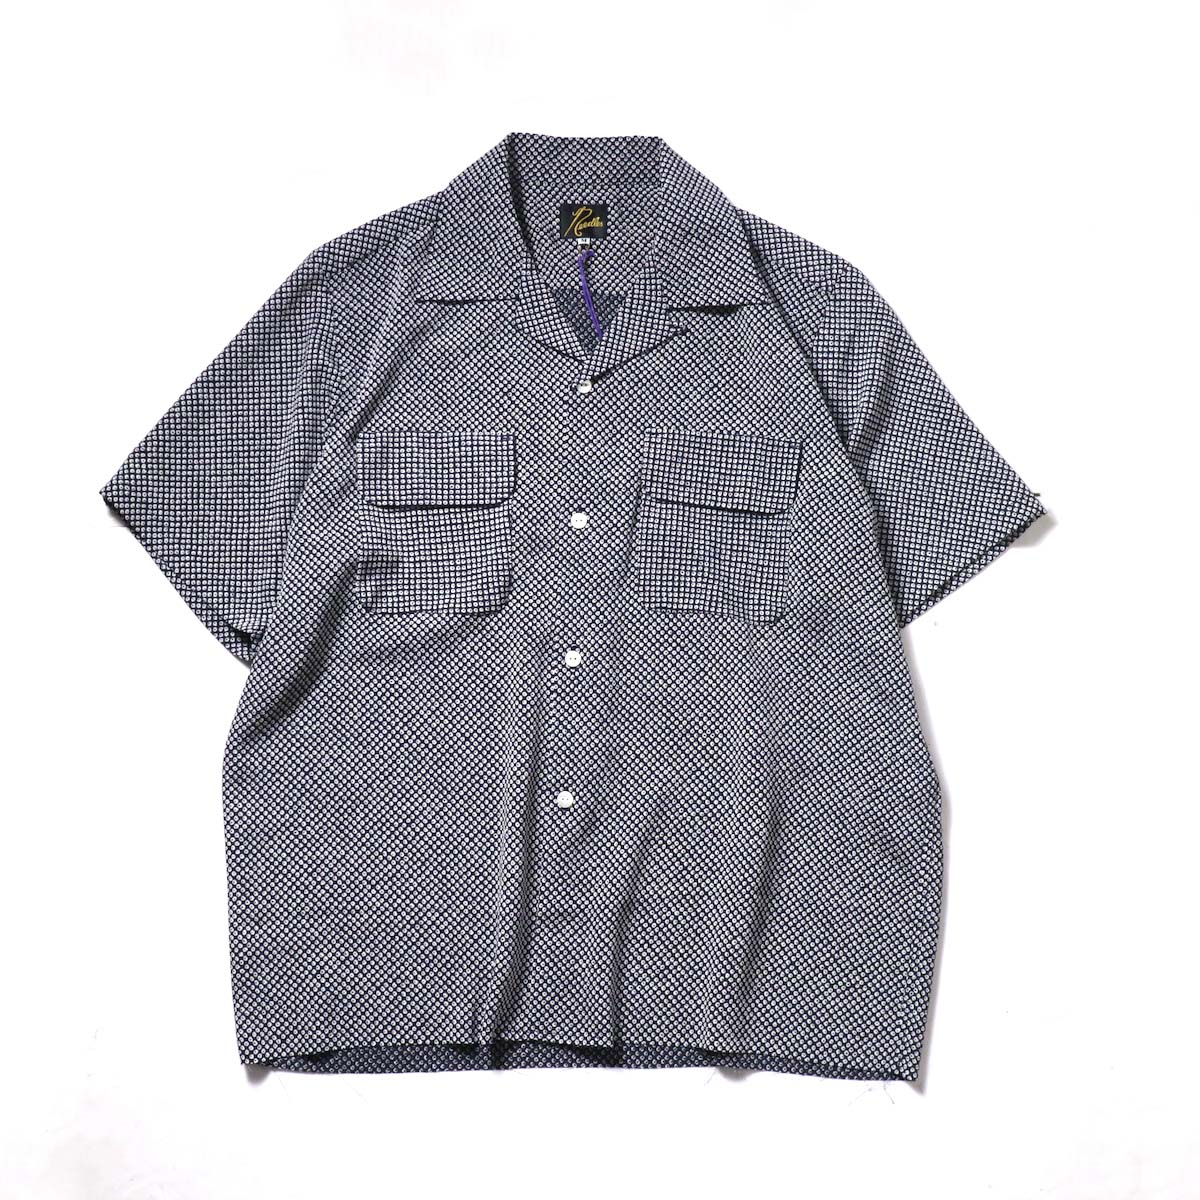 Needles / C.O.B. S/S Classic Shirt - Poly Crepe (Hitta)